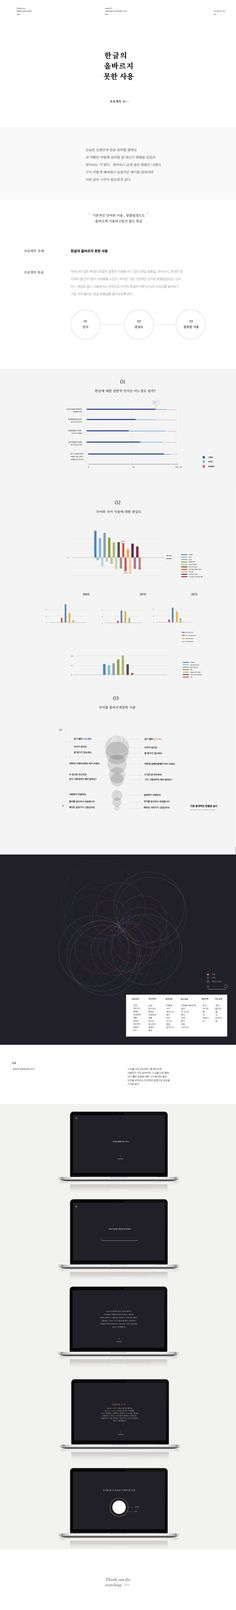 Burn In Kyung | Incorrect use of Hangul | Information Visualization 2016│ Major in Digital Media Design │#hicoda │hicoda.hongik.ac.kr